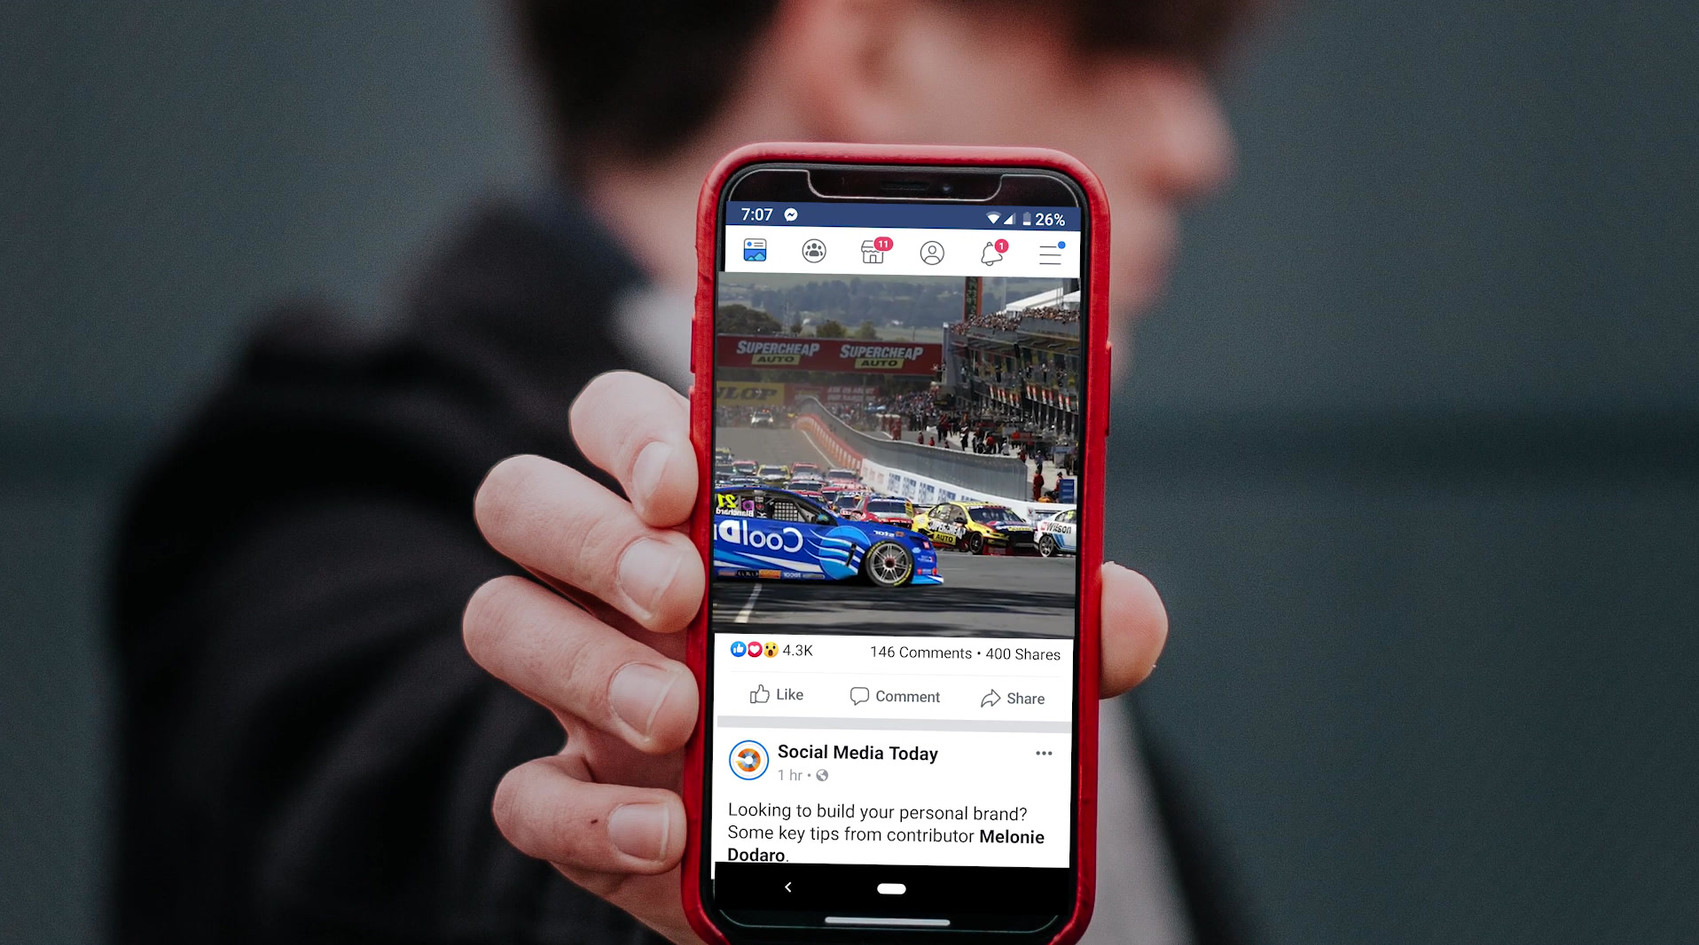 Supercars & Chip Foose Facebook campaign